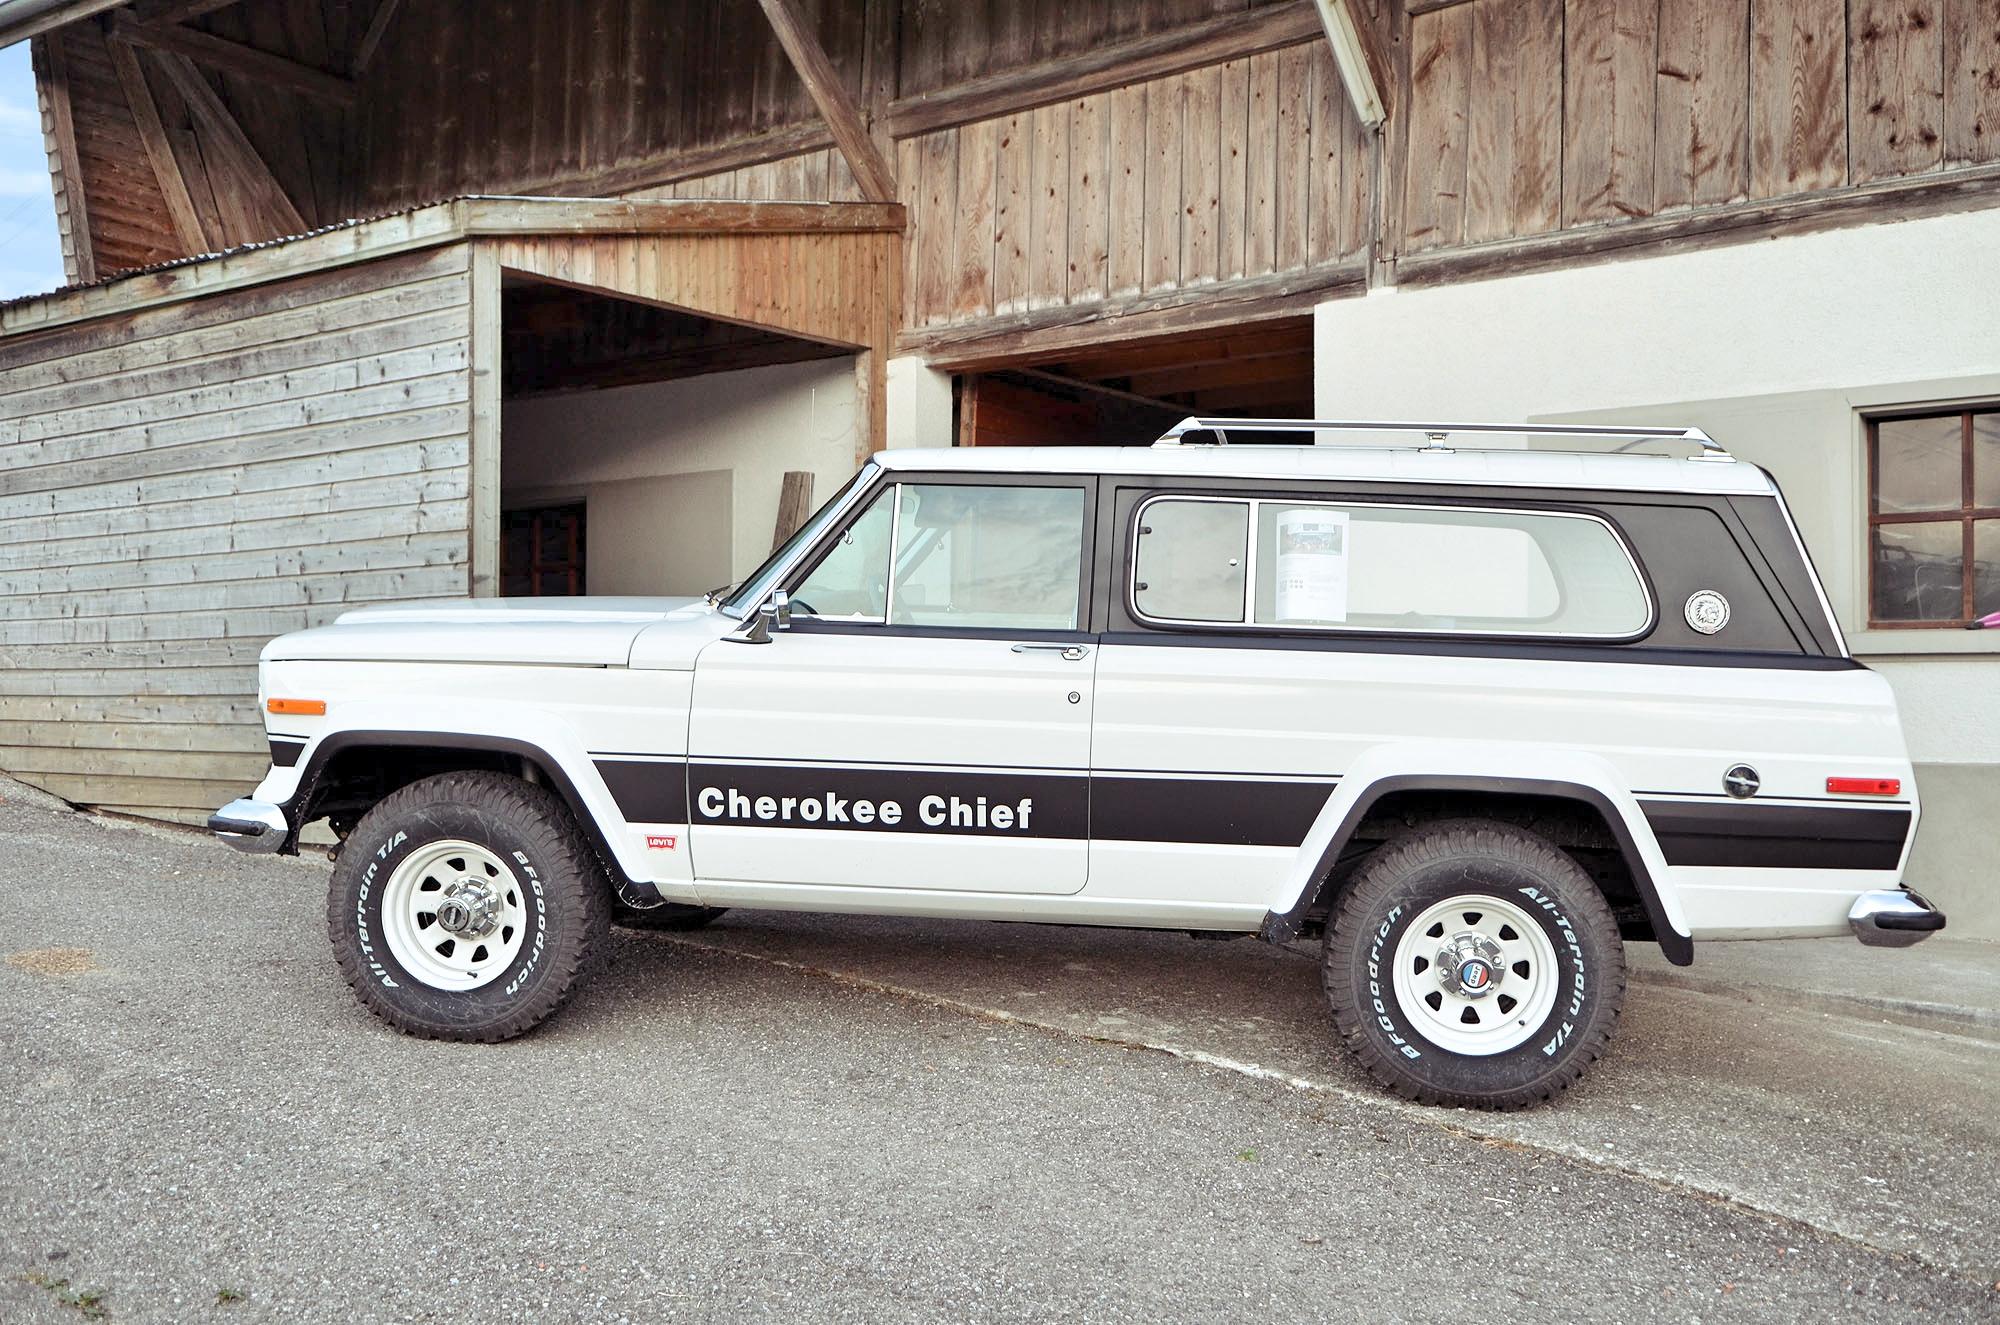 jeep-cherokee-chief-valloire-201.JPG